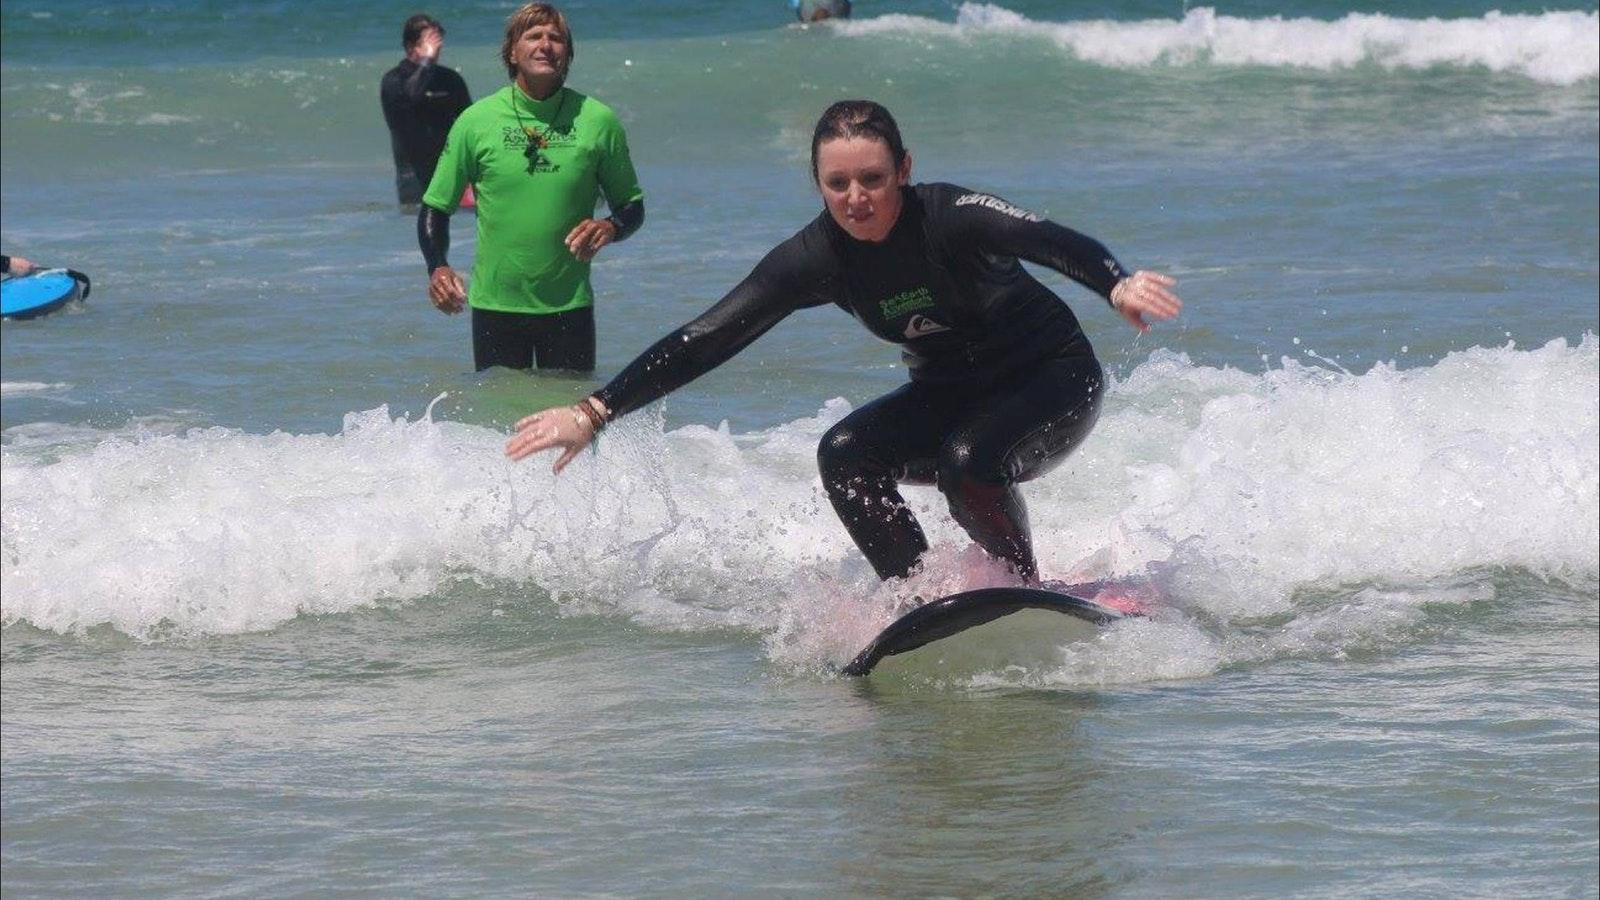 Rob + Surfer